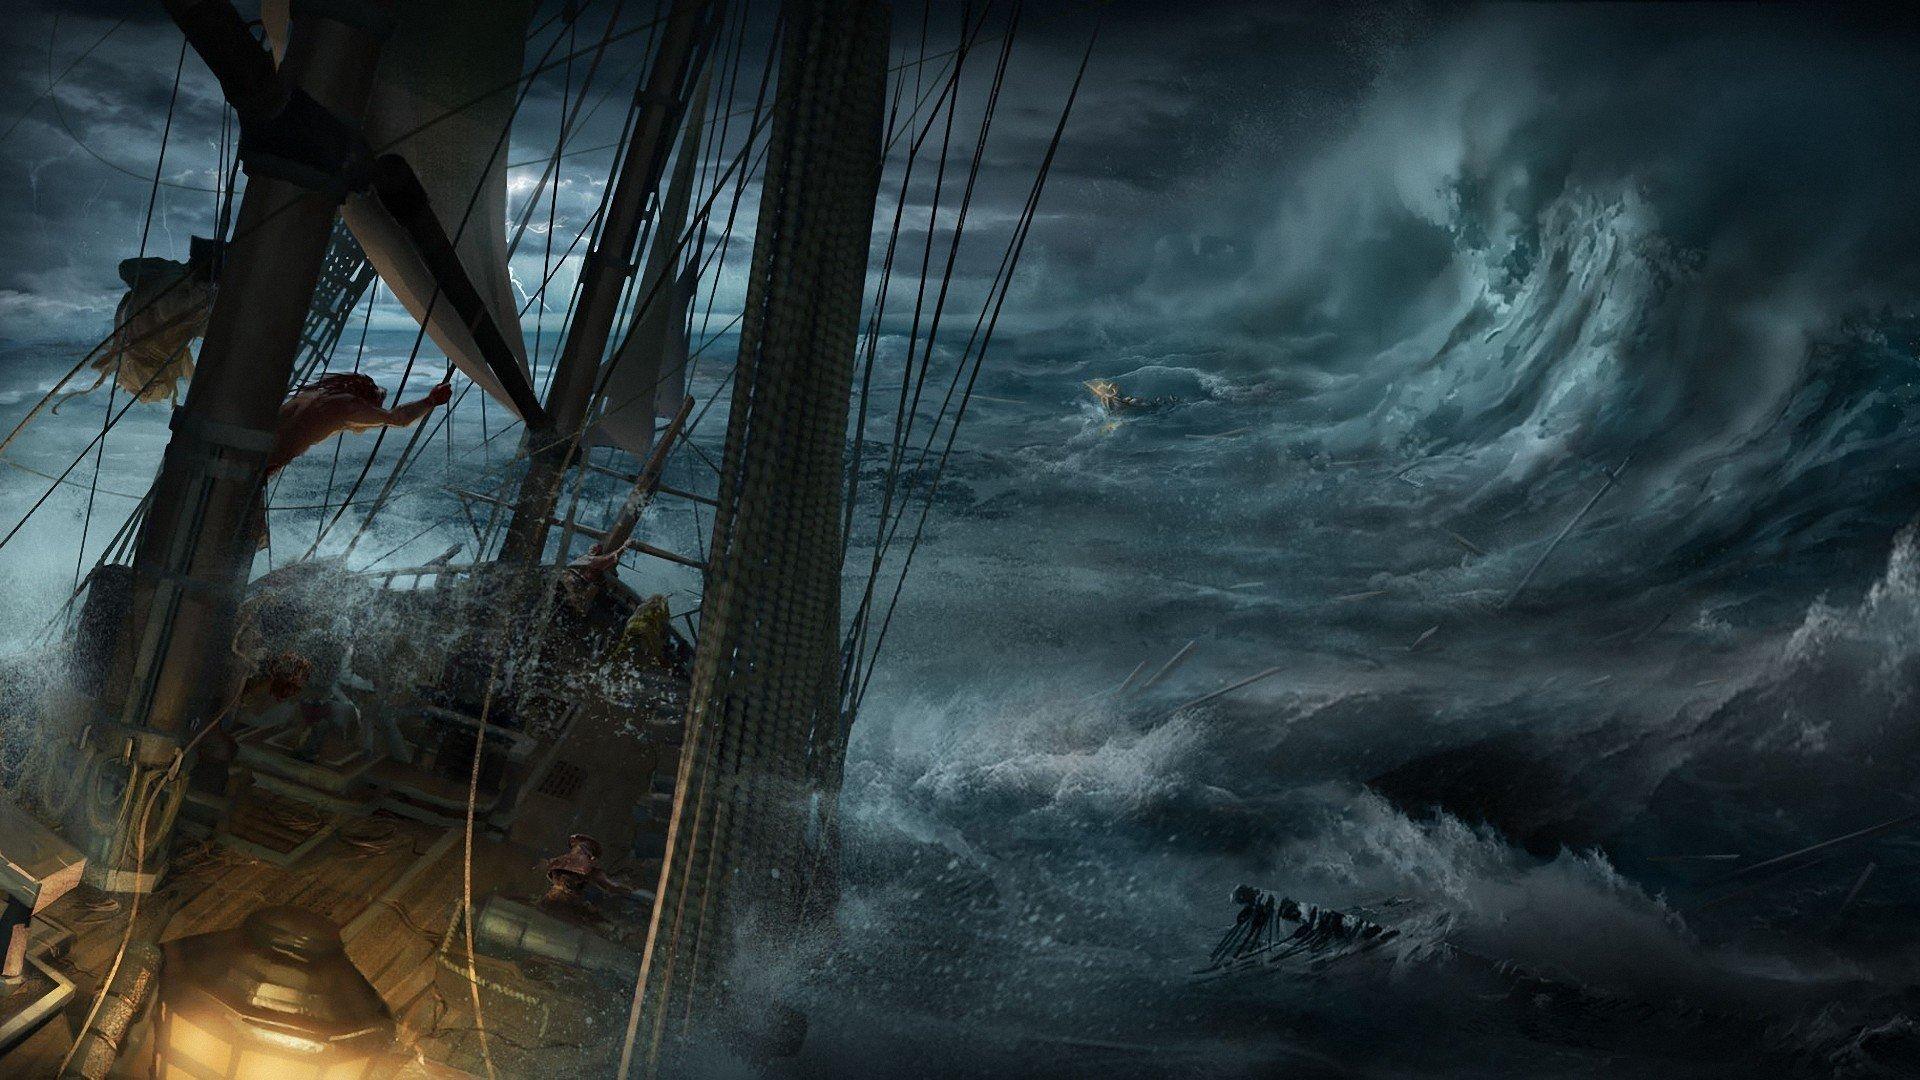 sailors, Nature, Water, Sea, Waves, Digital art, Sailing ship, Storm, Dark, Clouds, Ropes, Destruction, Assassin&039;s Creed III, Video games Wallpaper